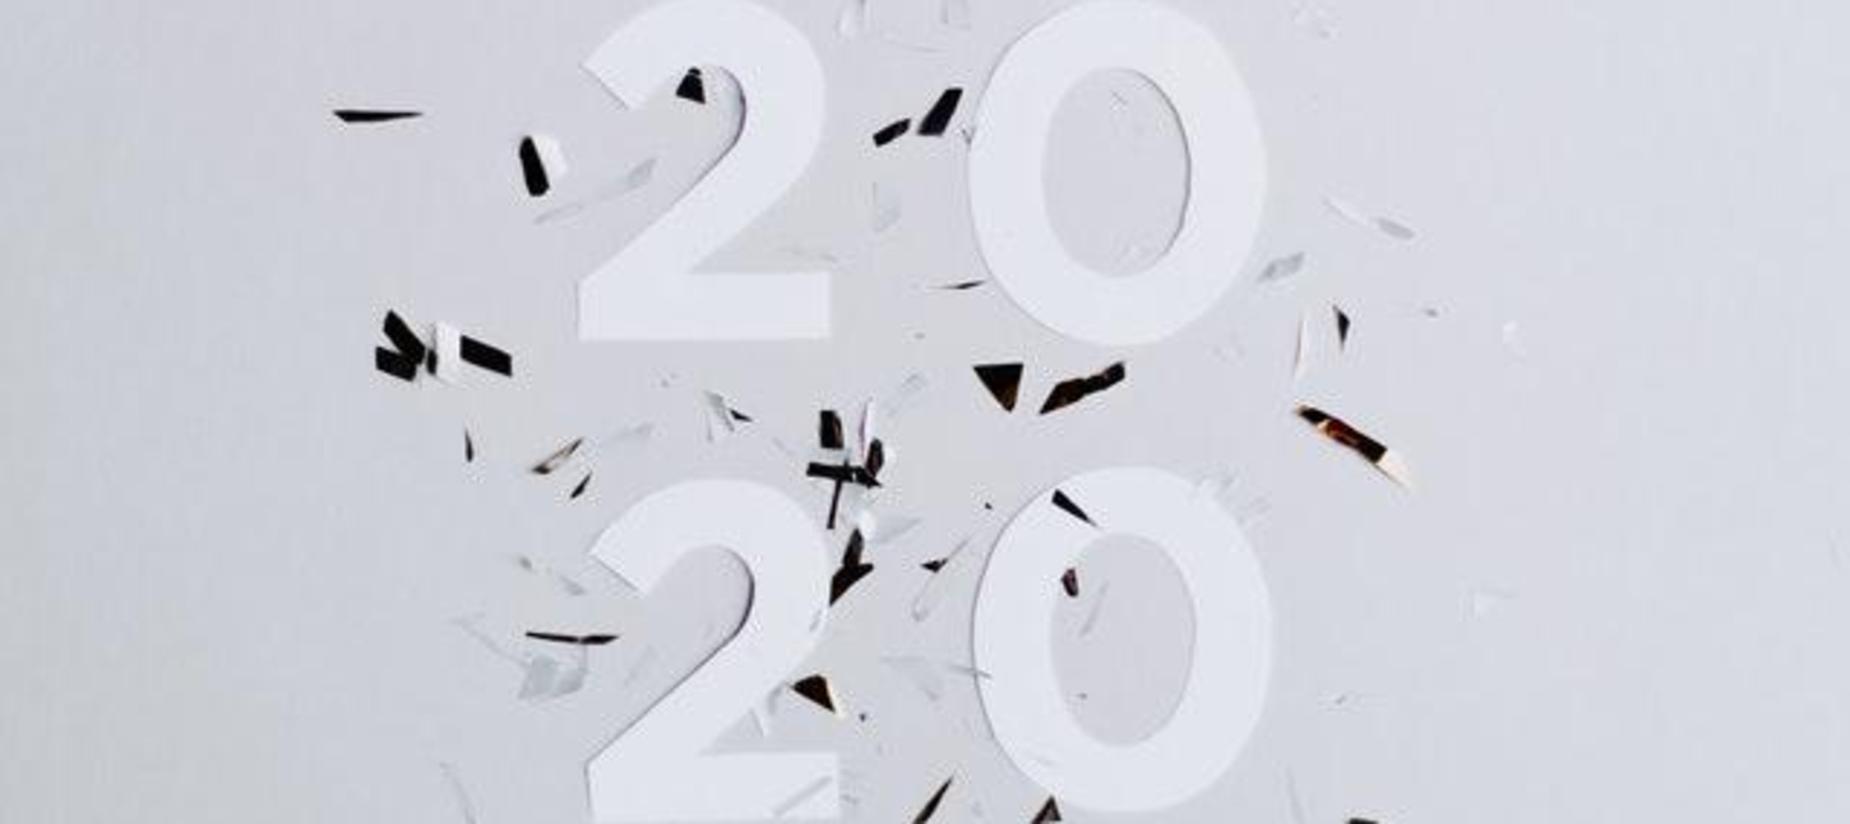 black & white numbers 2020